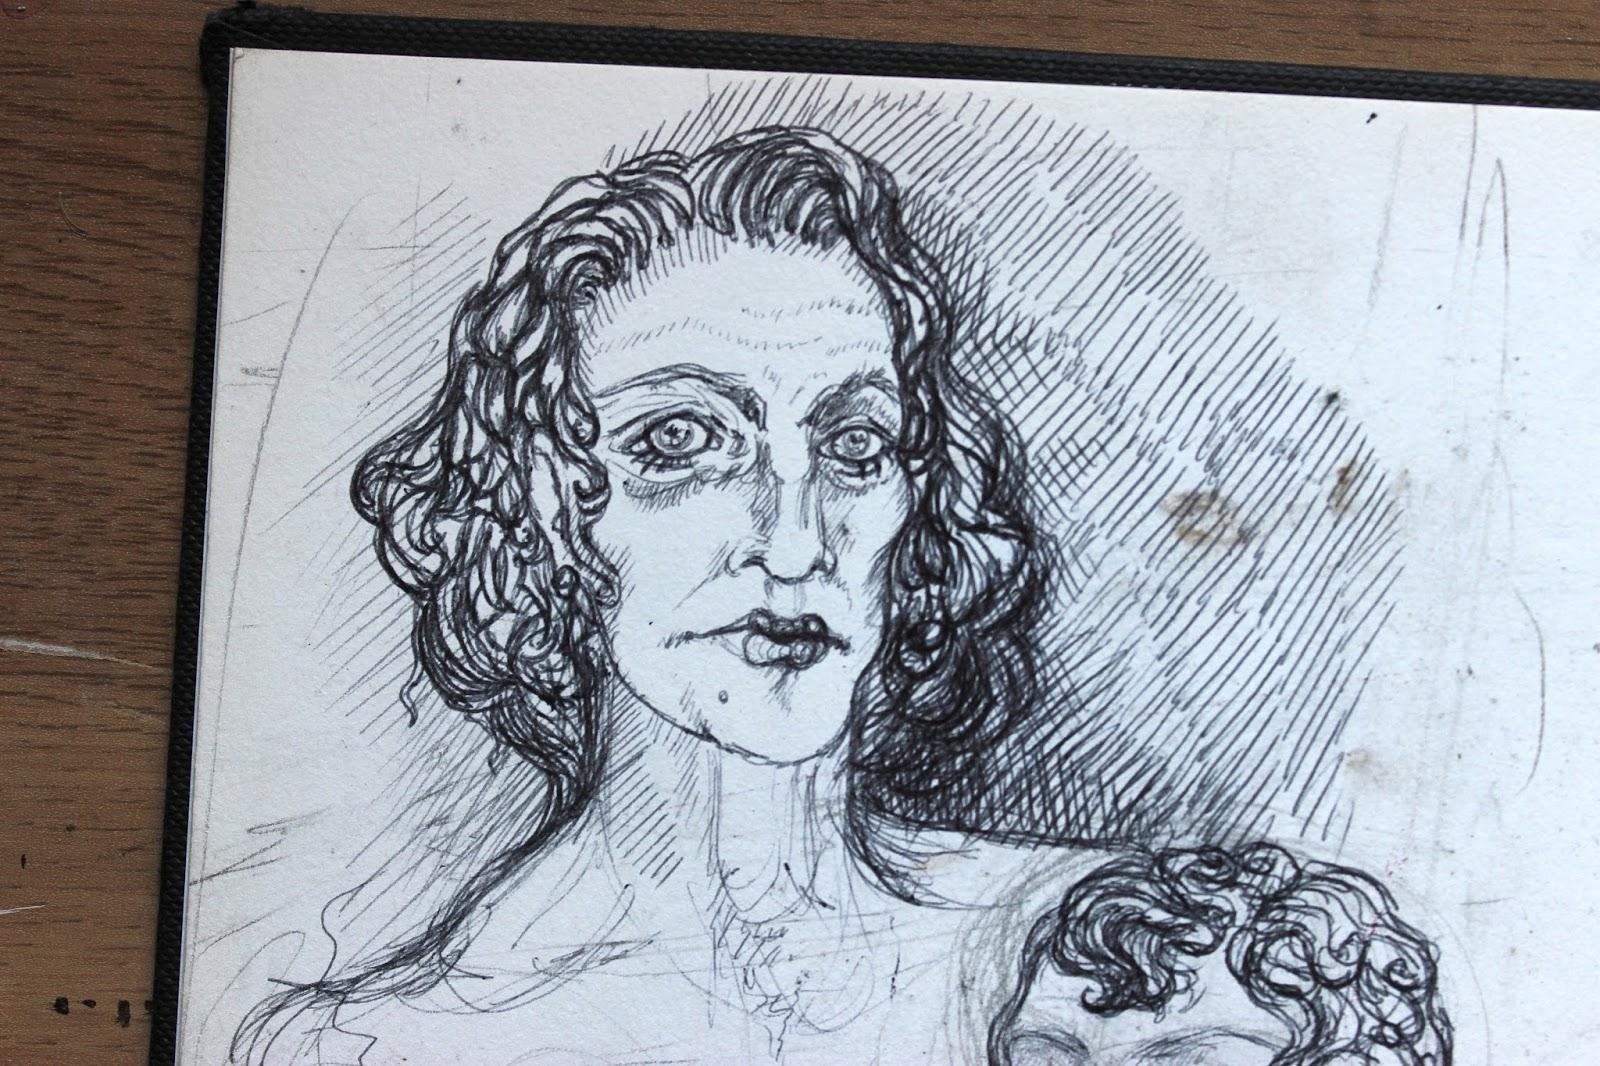 Sketchpad Notebook Sketch Drawing Pencil Portrait Pen Woman